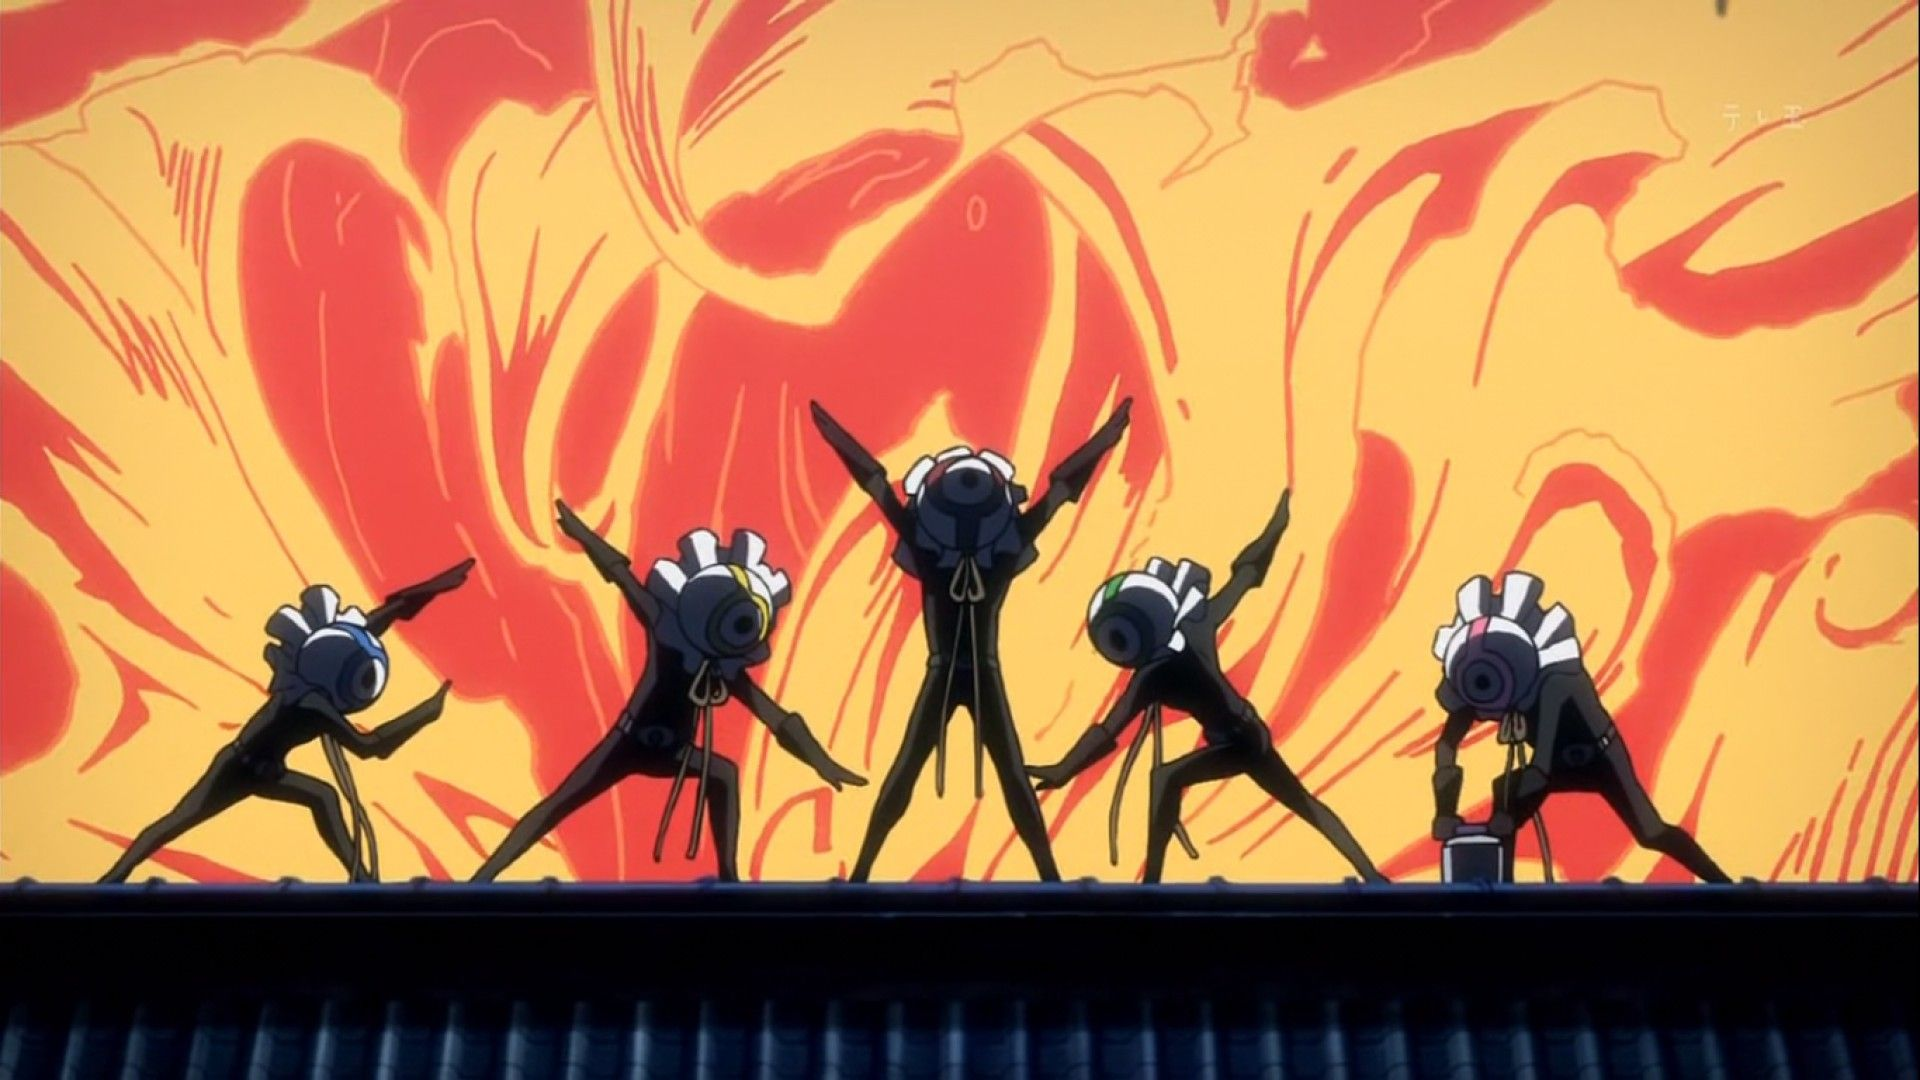 Mirai nikki by Briana C. on Favorite Anime's Anime, Free